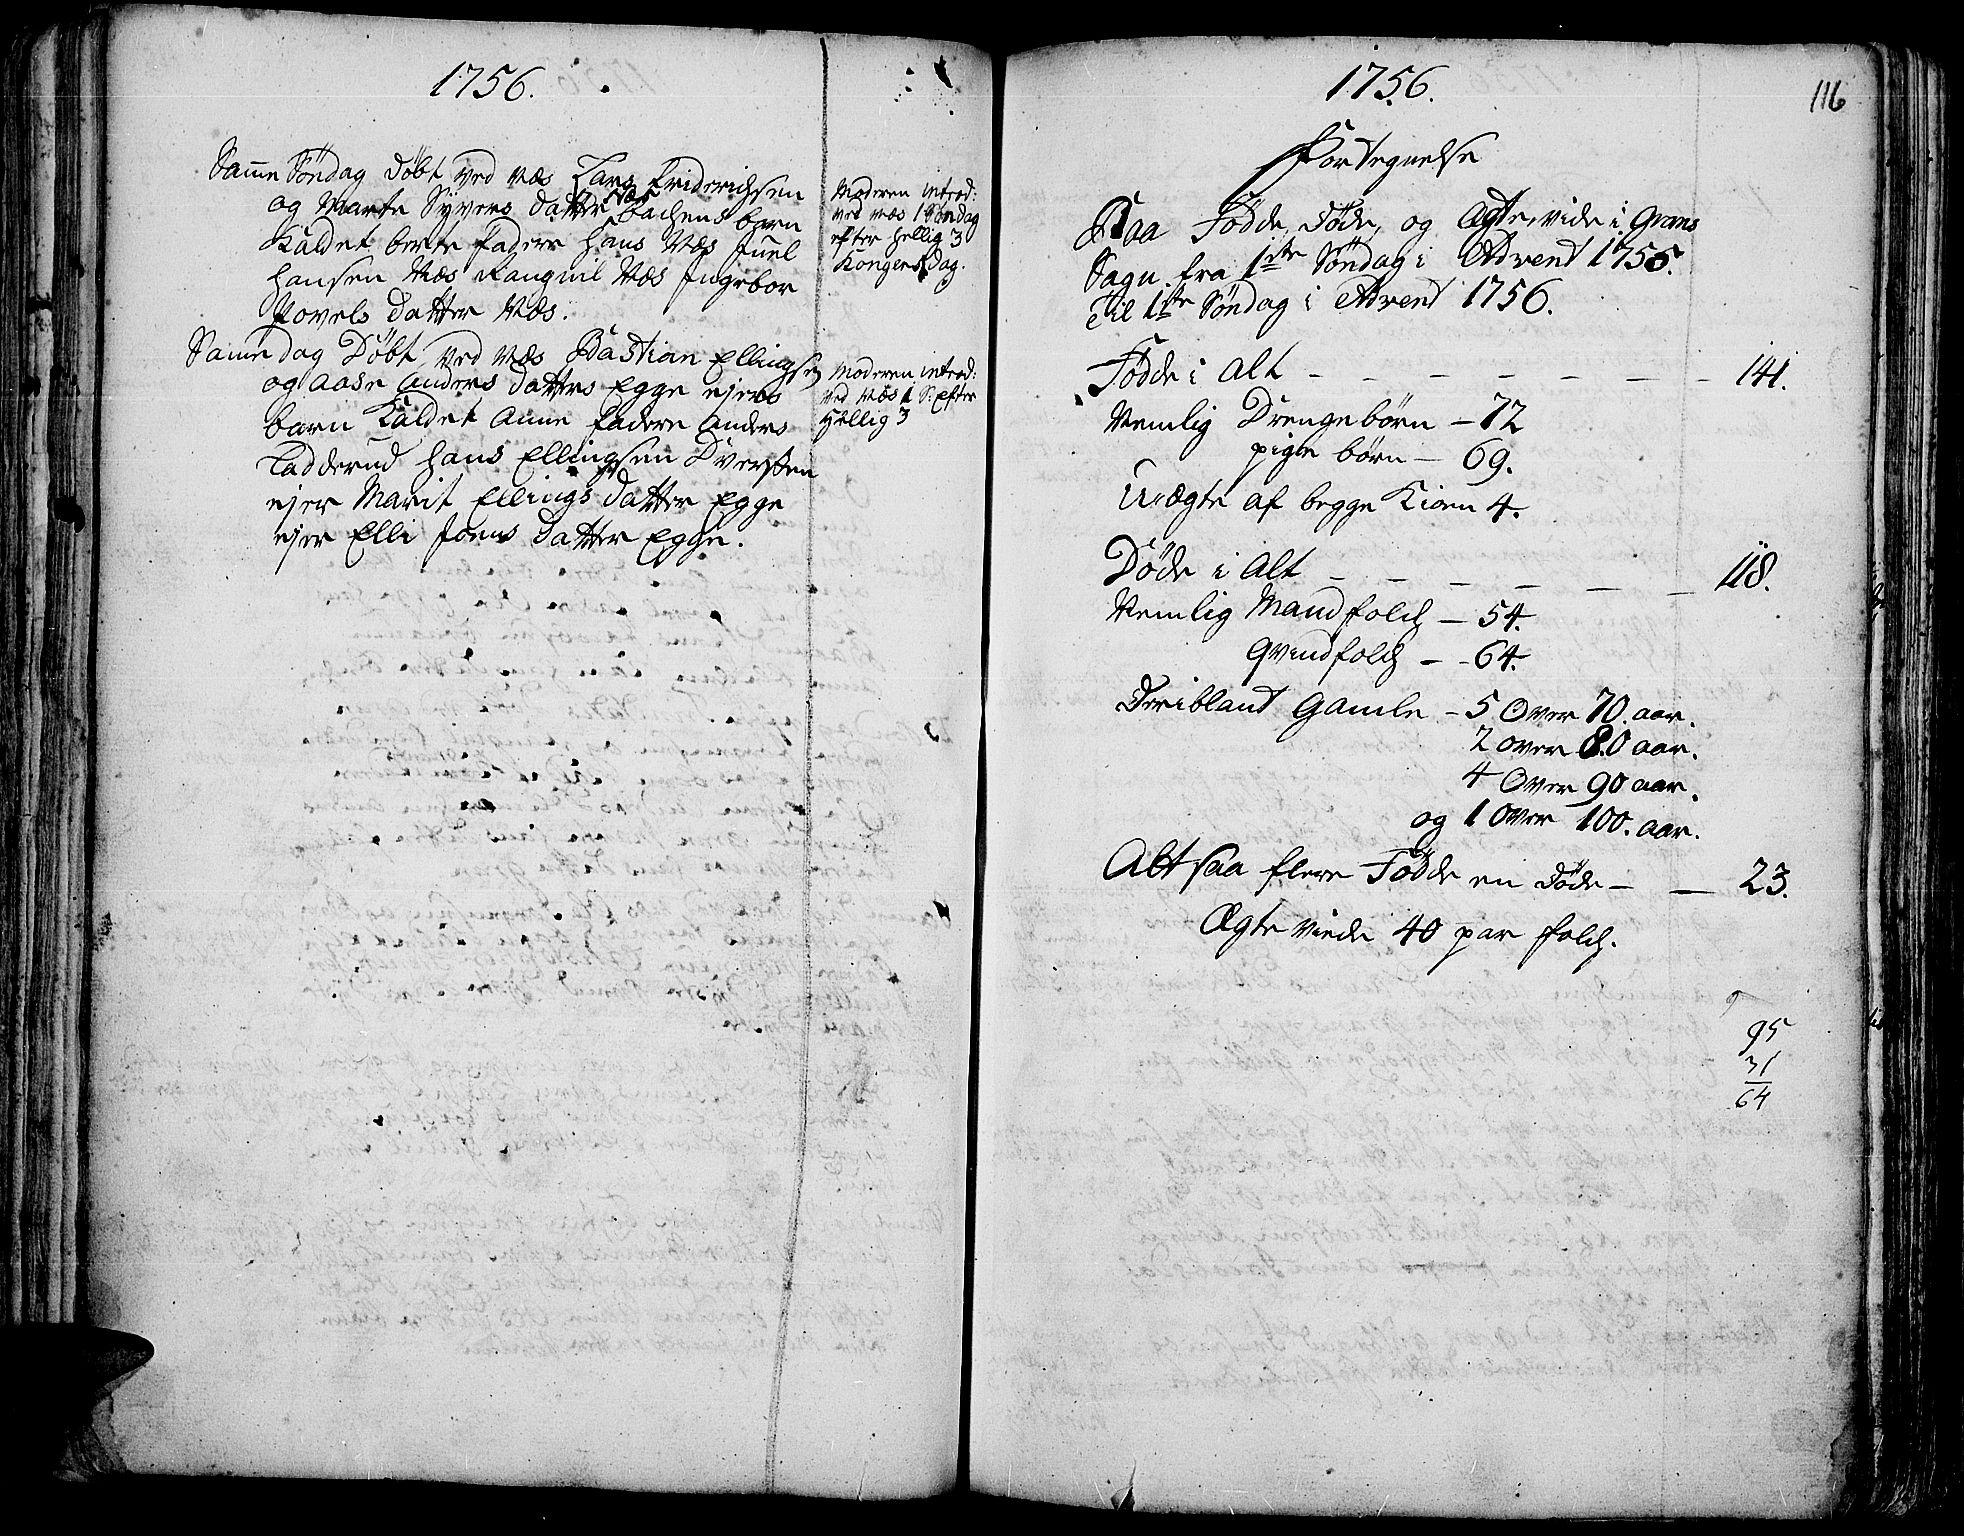 SAH, Gran prestekontor, Ministerialbok nr. 3, 1745-1758, s. 116